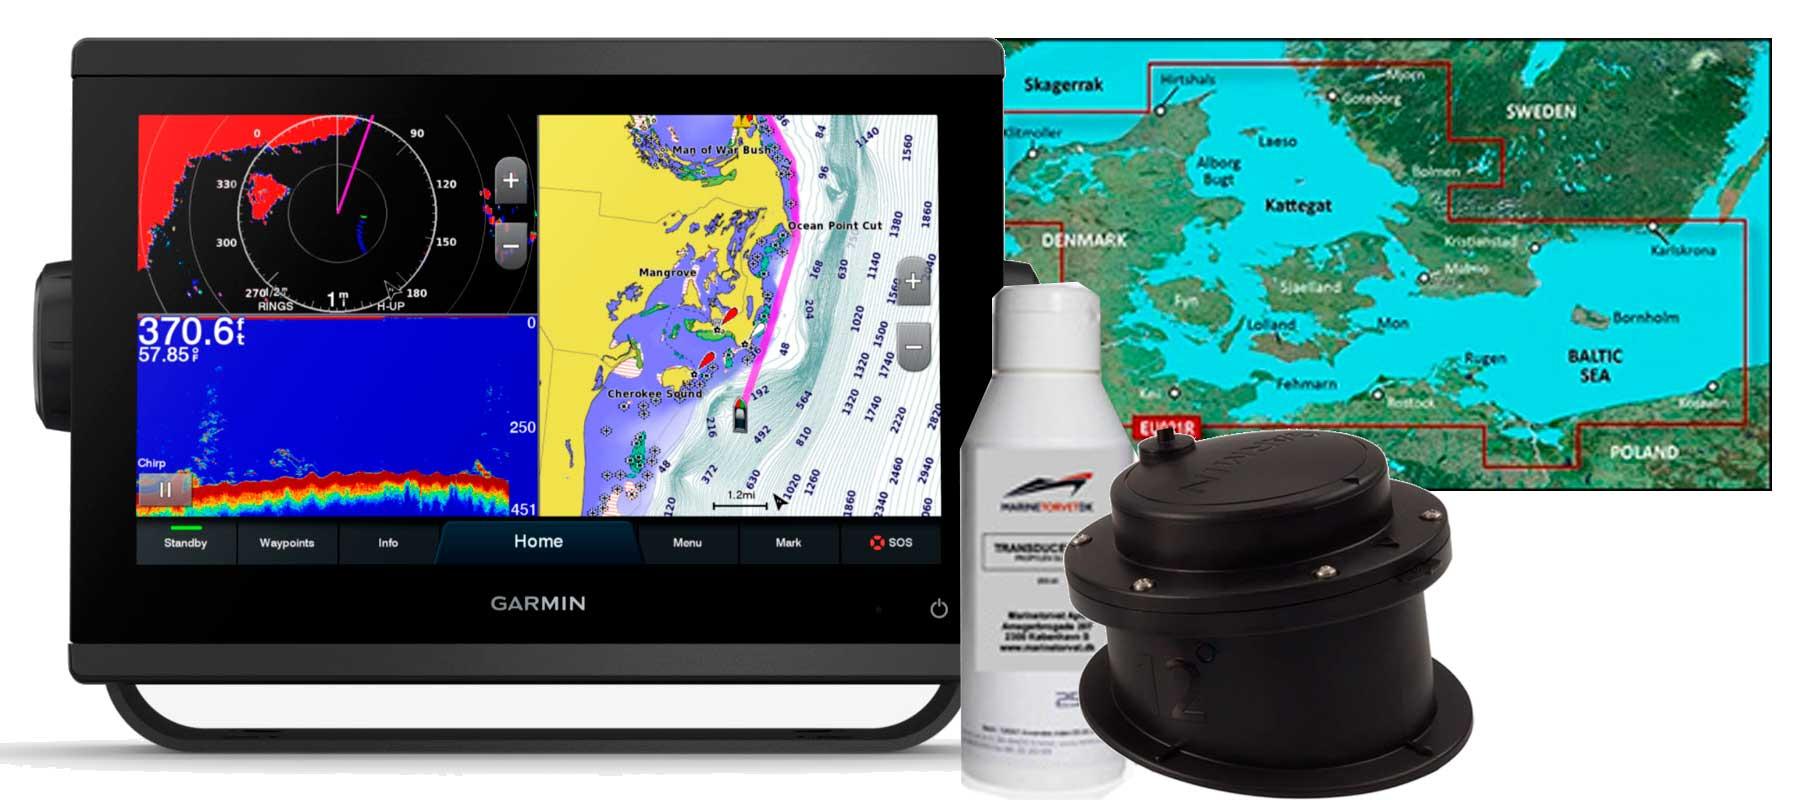 Garmin GPSmap 923xsv, GT15M-IH og HXEU021R